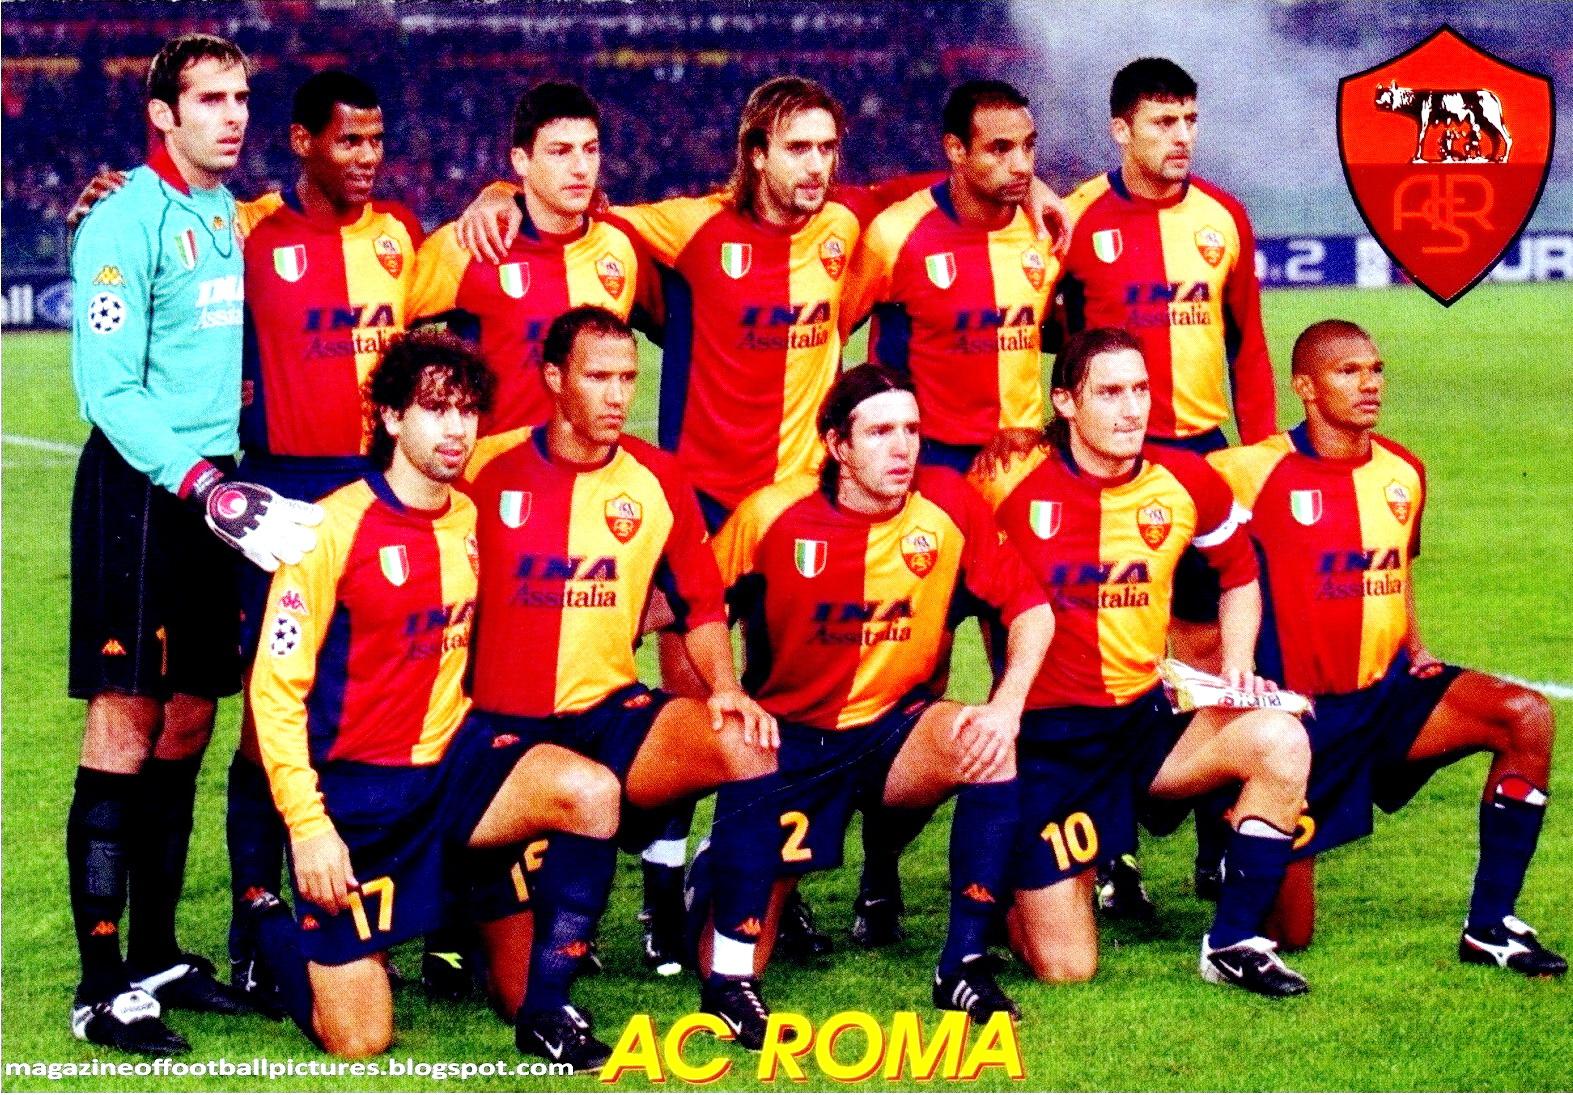 b423c0a36837e EQUIPOS DE FÚTBOL  ROMA contra Liverpool 05 12 2001